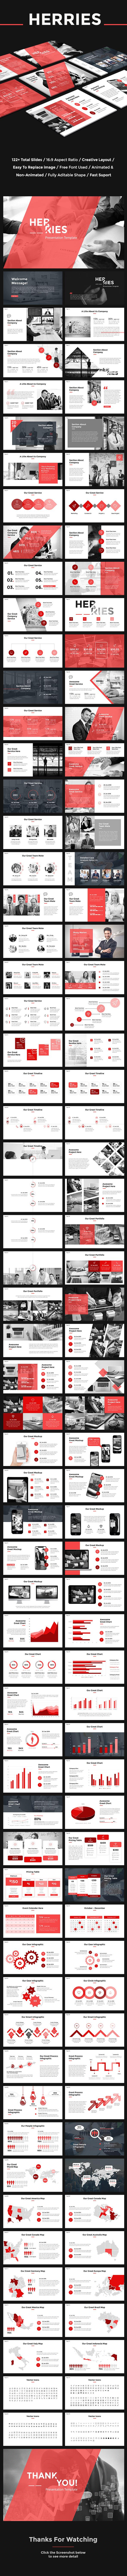 Herries Clean Business Pitch Deck Google Slides - Google Slides Presentation Templates